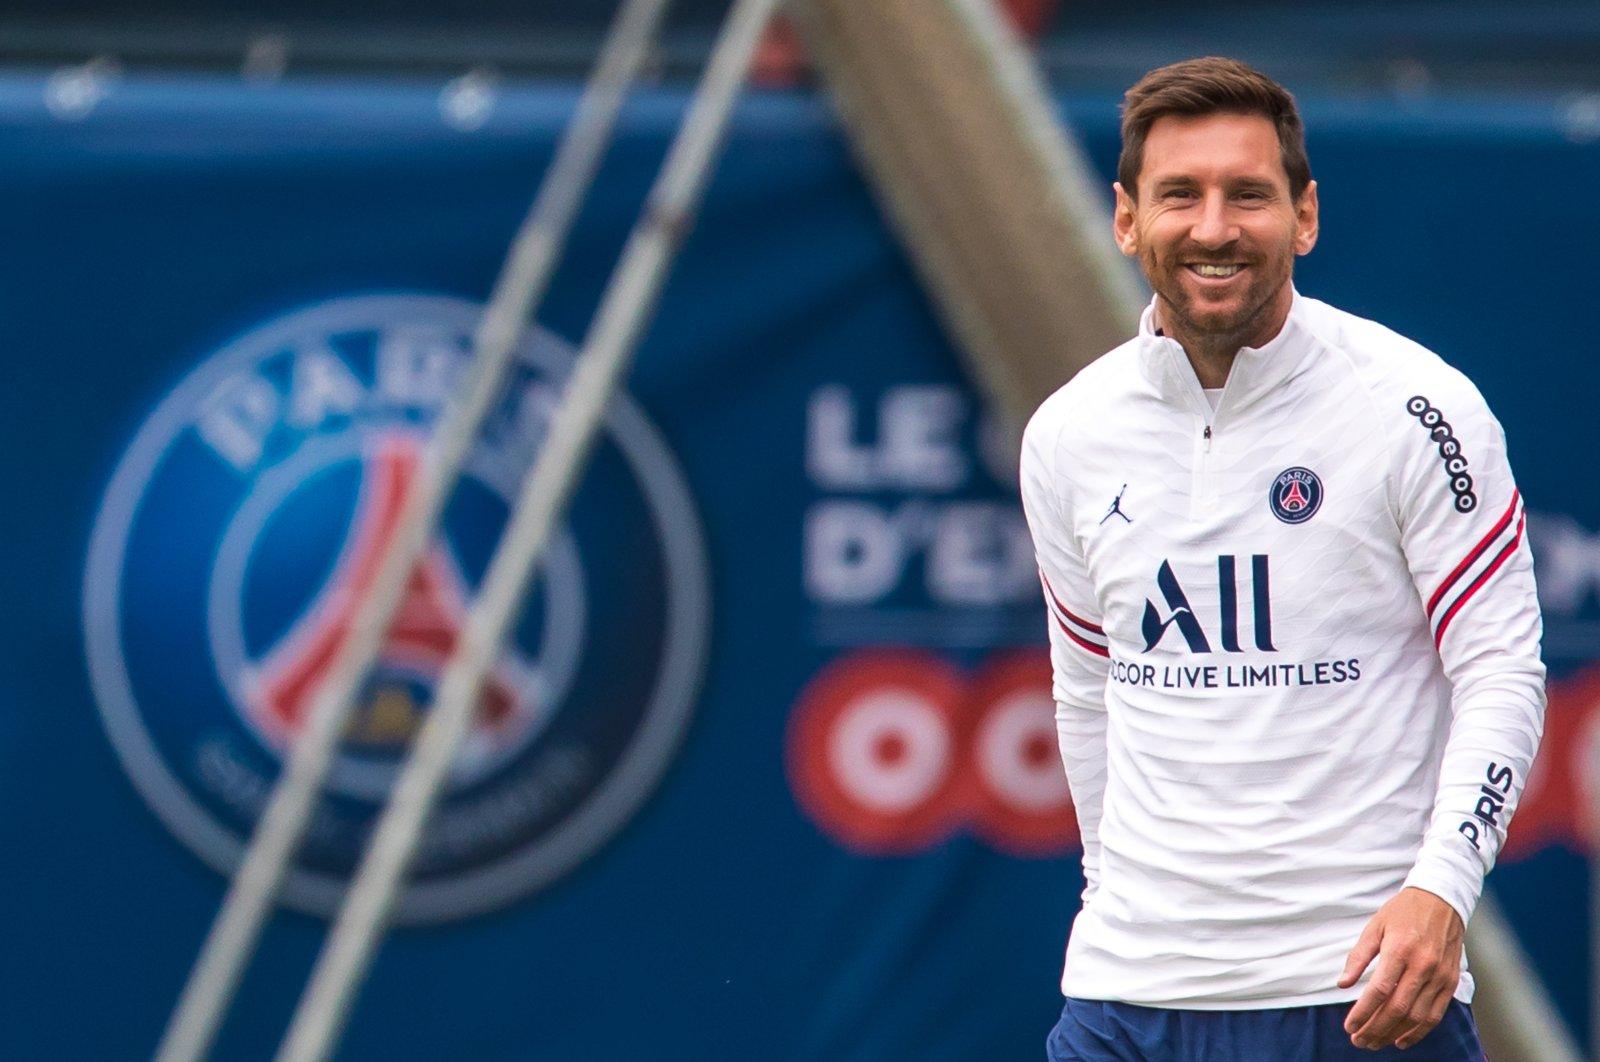 PSG's Lionel Messi during a training session at the Camp des Loges sports complex near Paris, France, Aug. 19, 2021. (EPA Photo)